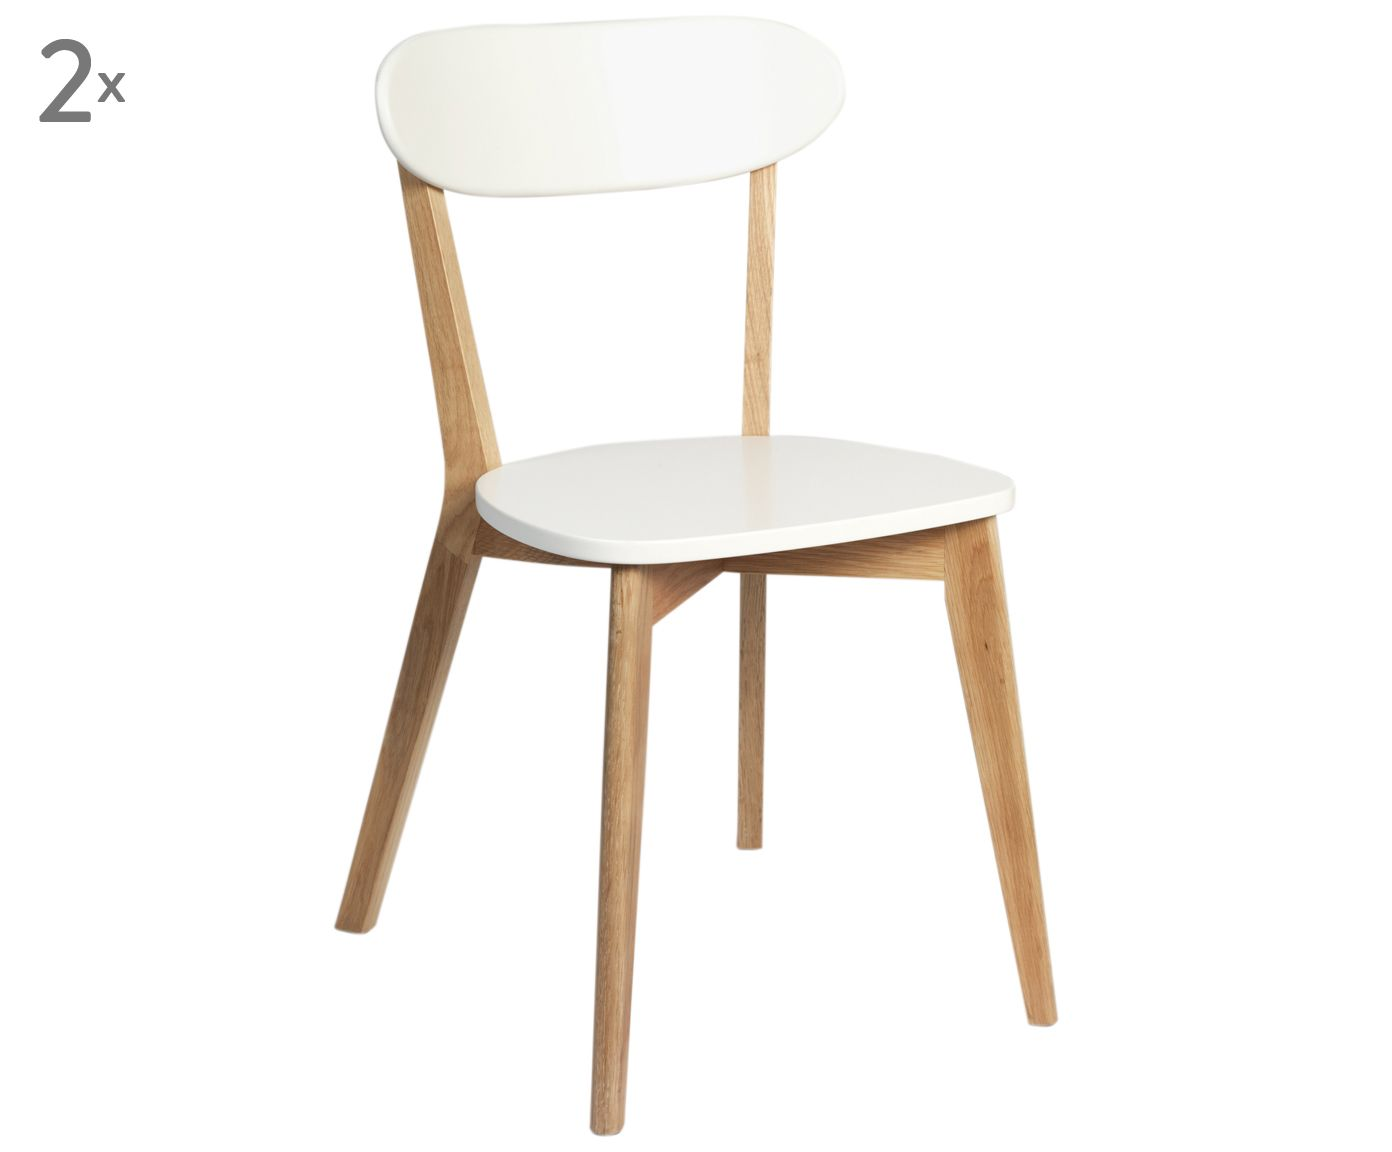 Ordinary Tolles Dekoration Hans Wegner Stuhl 2 #12: Explore Folding Chair, Link, And More!